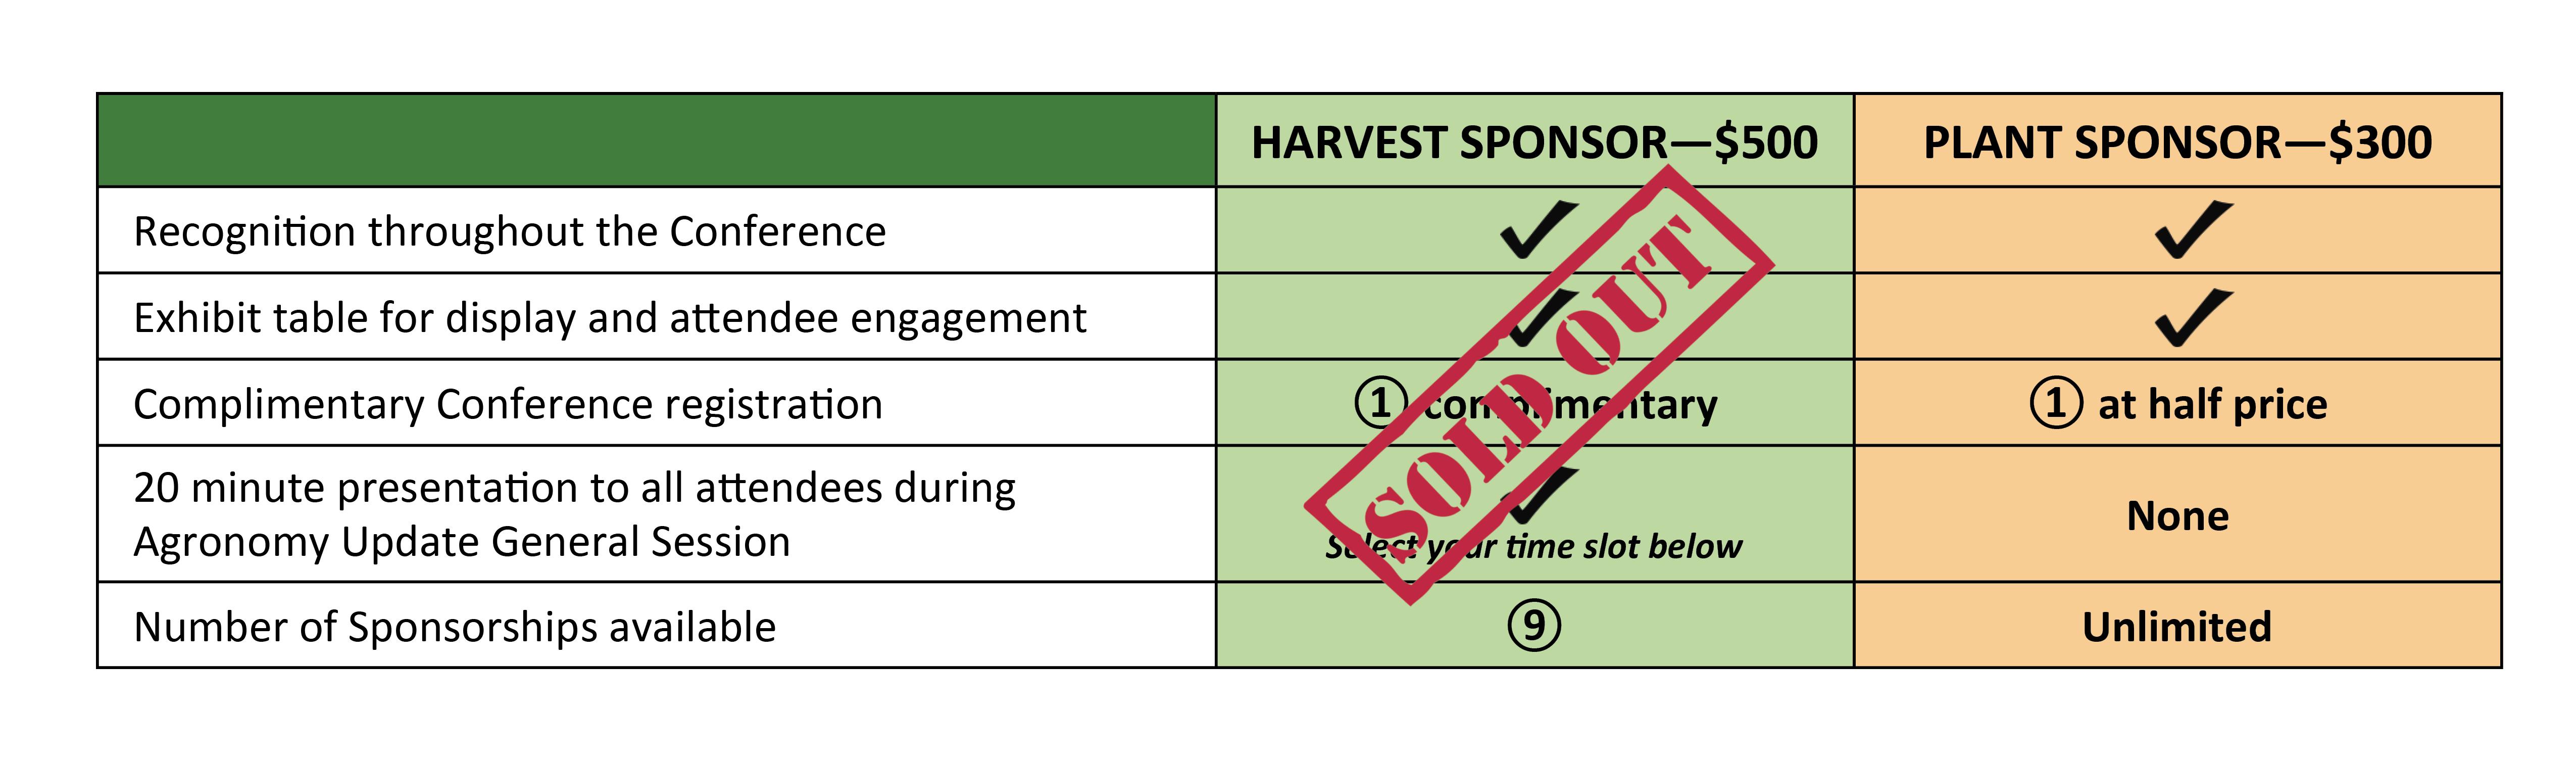 2019KCSC_SponsorshipBenefitsFINAL_HarvestSoldOut